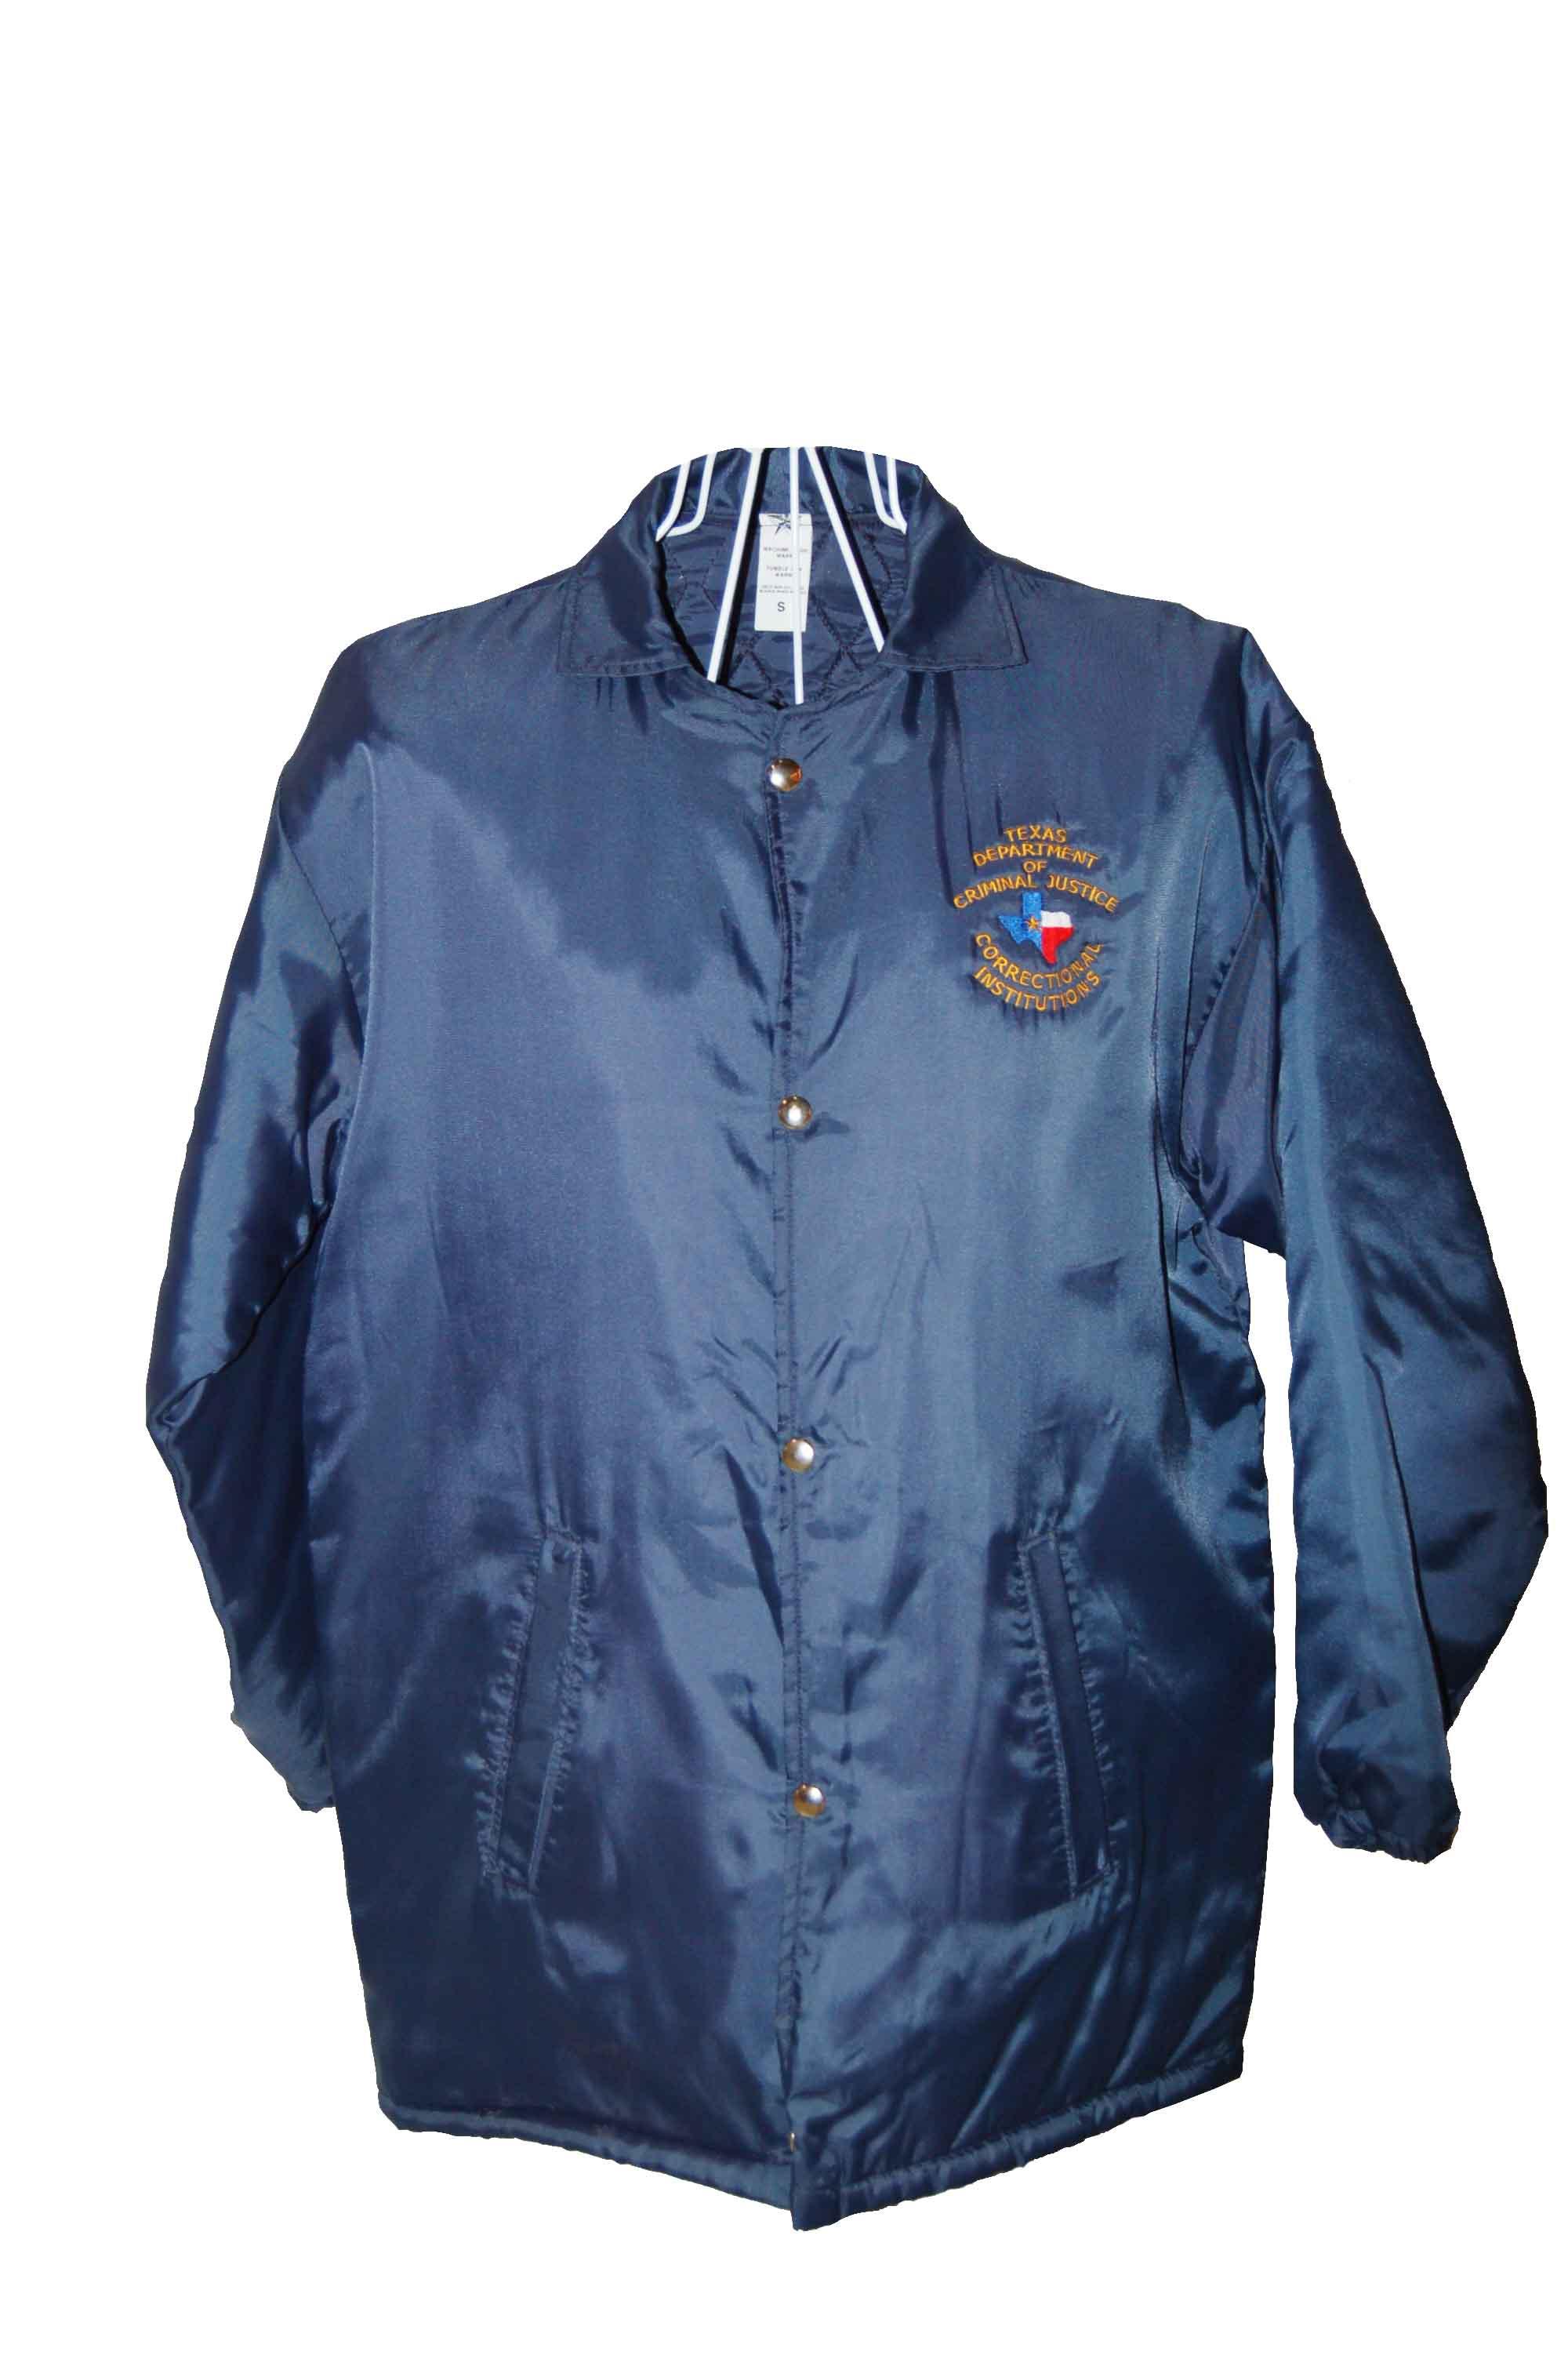 Tci Garment Textile Apparel Amp Clothing Windbreaker